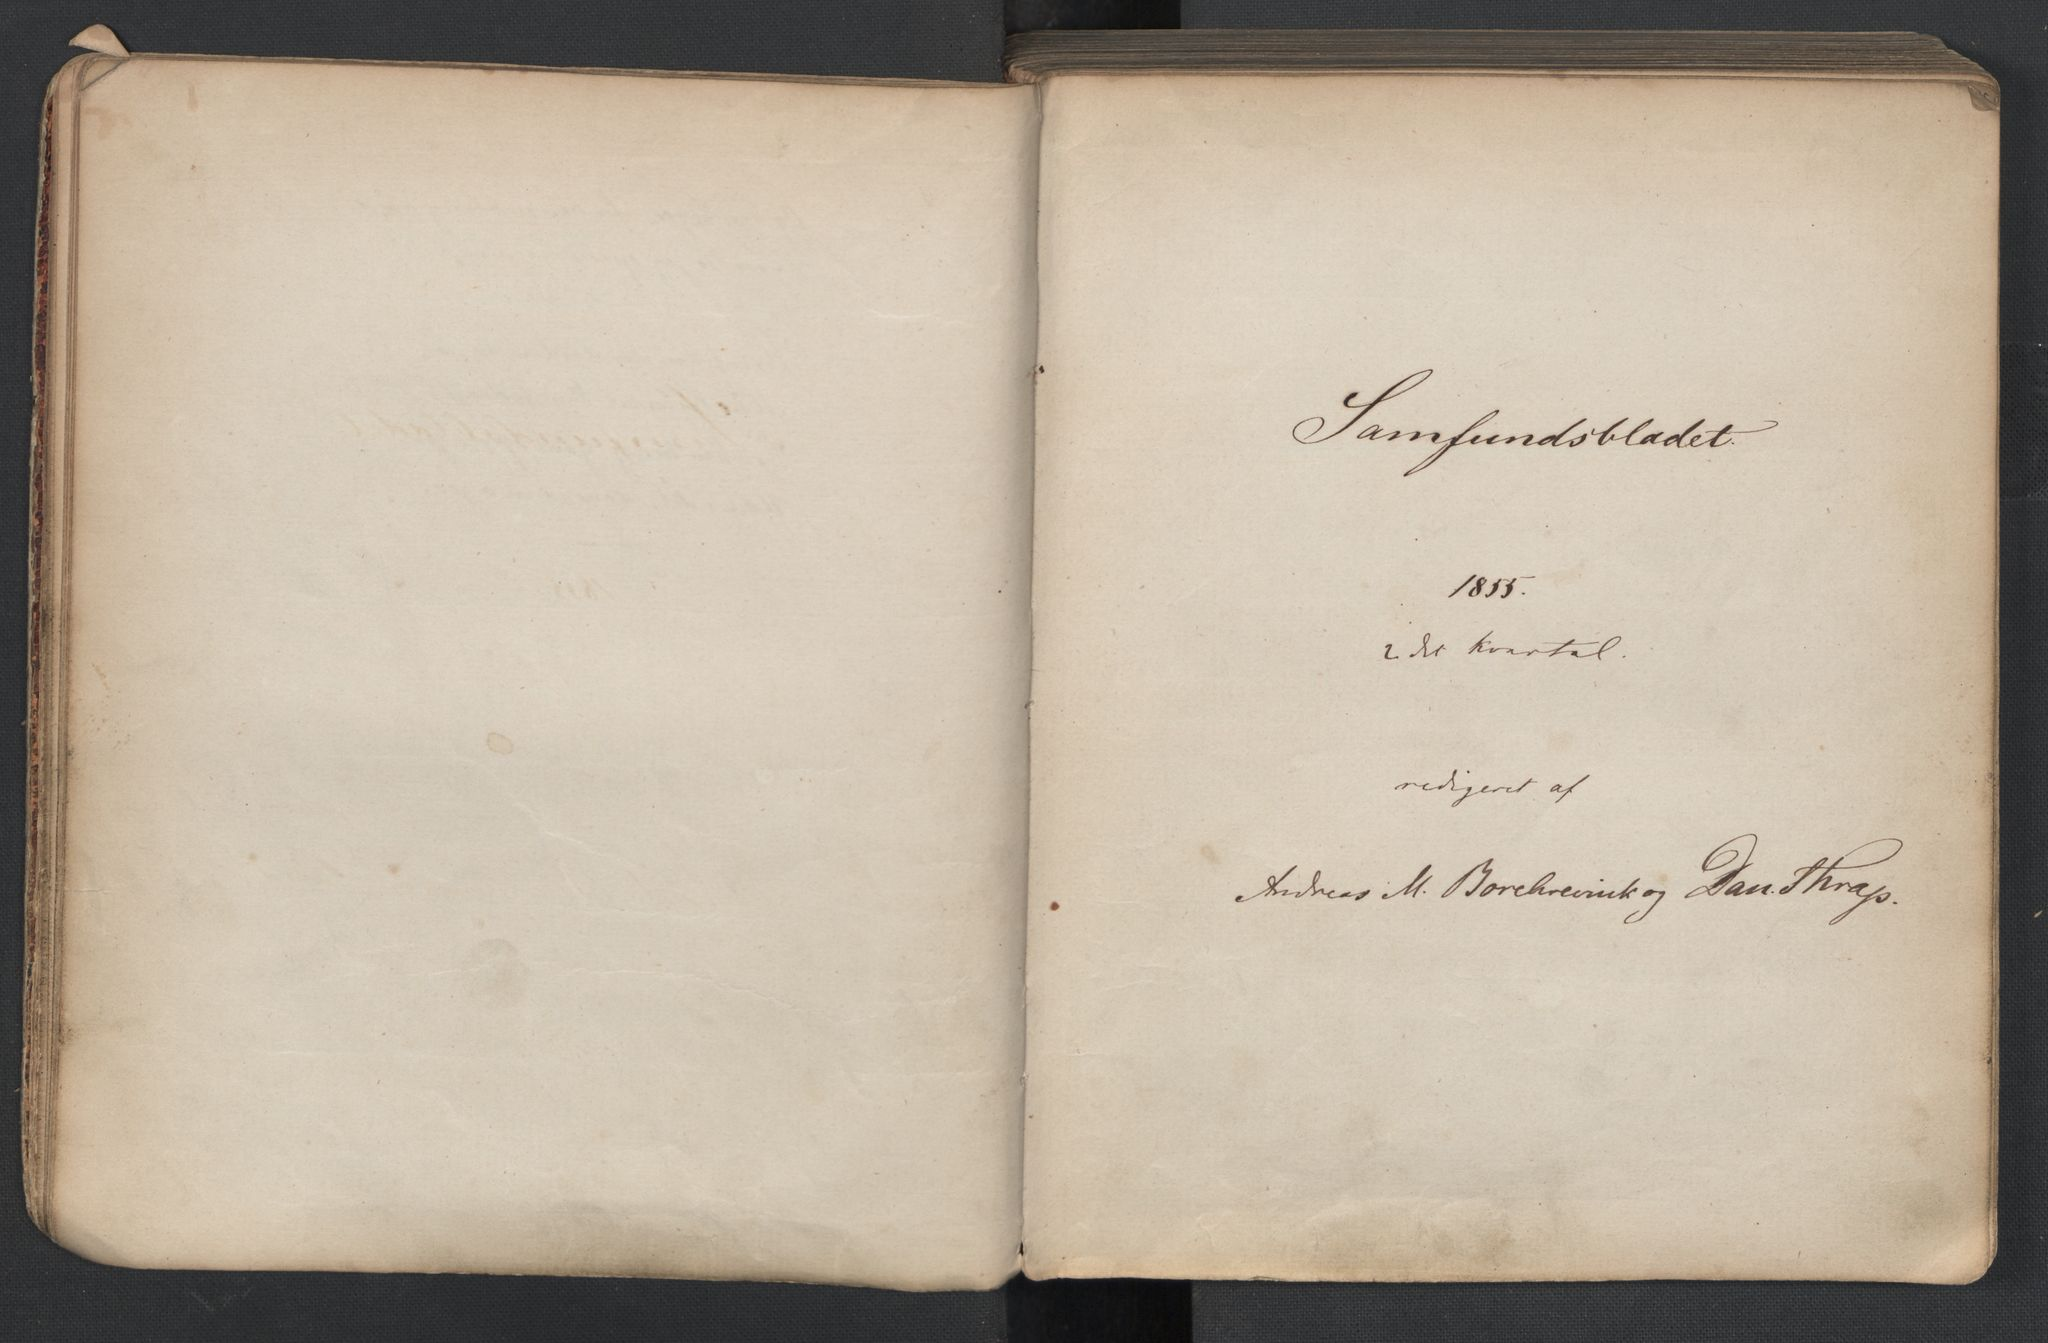 RA, Det Norske Studentersamfund, X/Xa/L0005, 1855-1856, s. 13